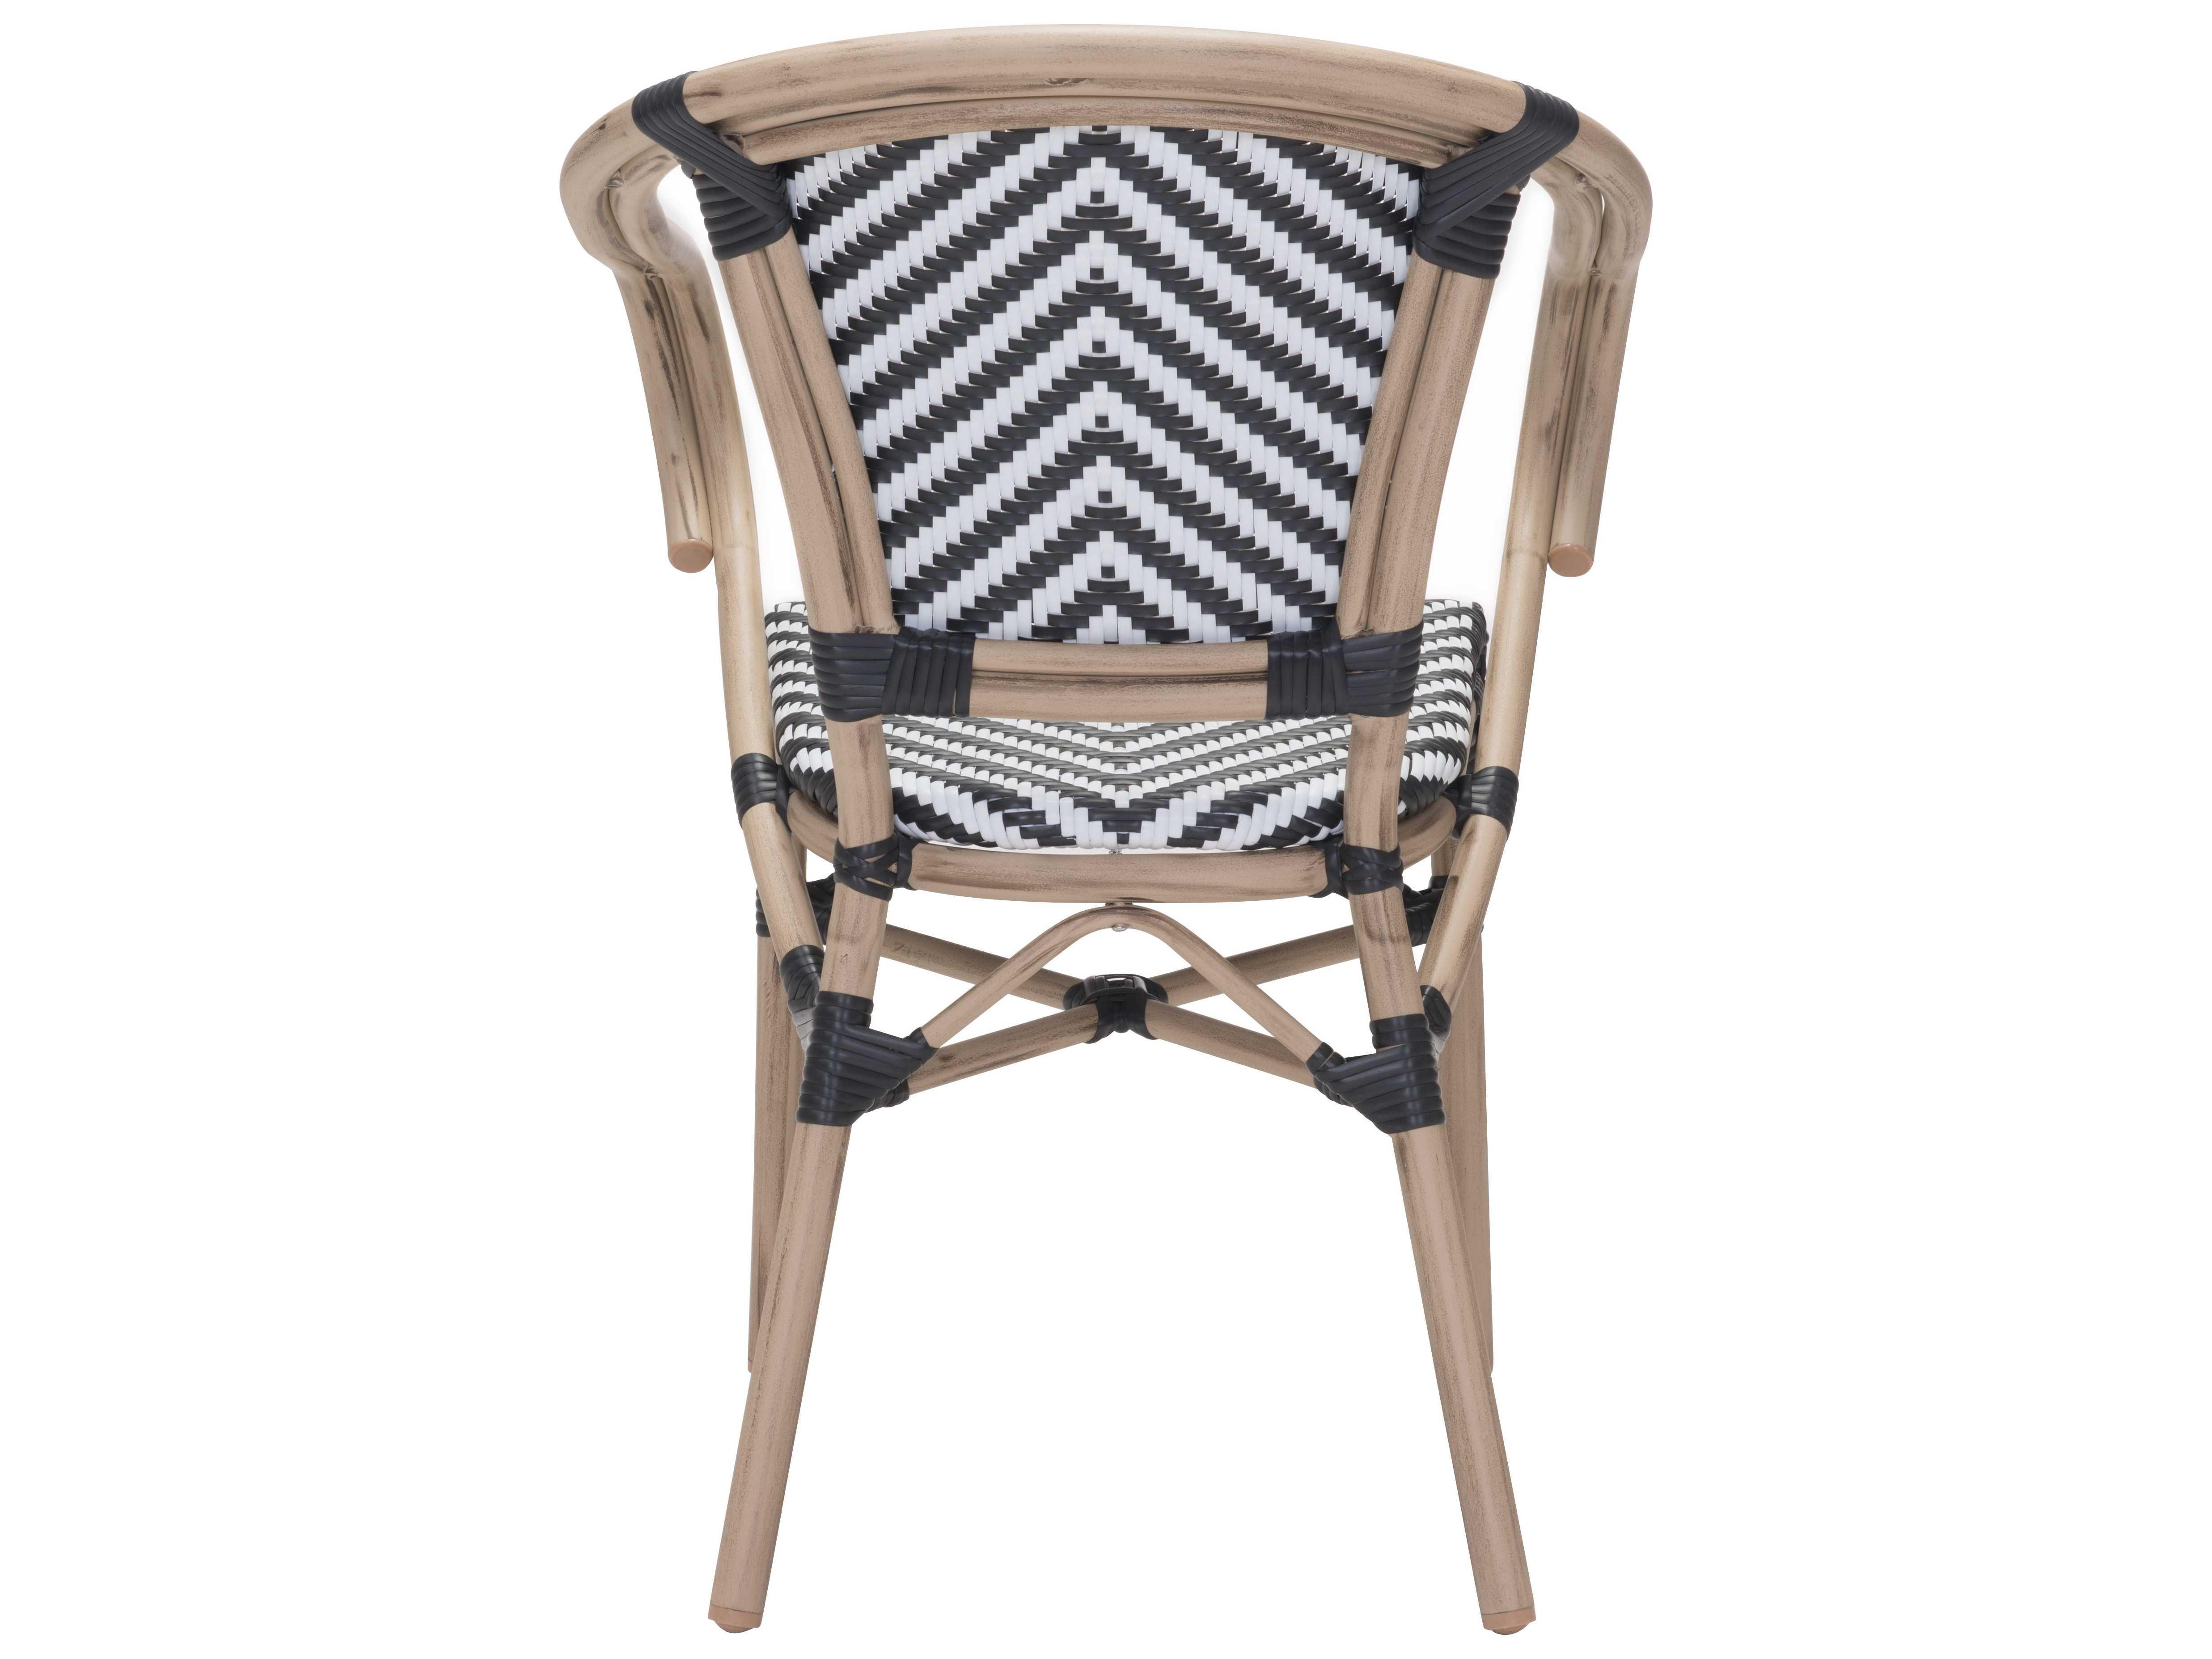 100 Zuo Outdoor Furniture Zuo Outdoor Trimaran Teak 27  : ZD7038024zm from 104.207.154.55 size 4947 x 3711 jpeg 440kB